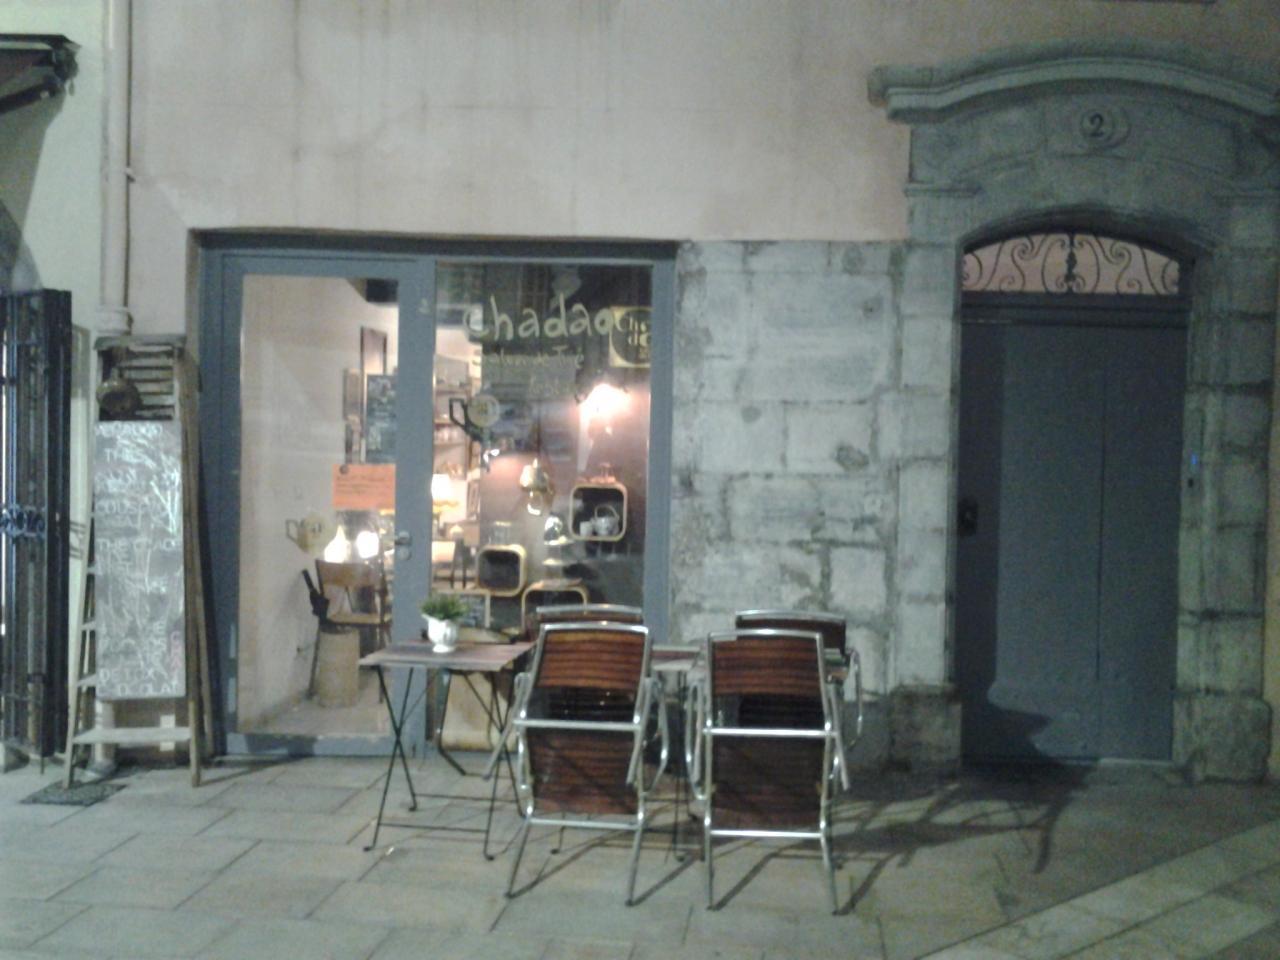 Café-Sexo du 22 novembre 2016 au Chadao, Toulon.